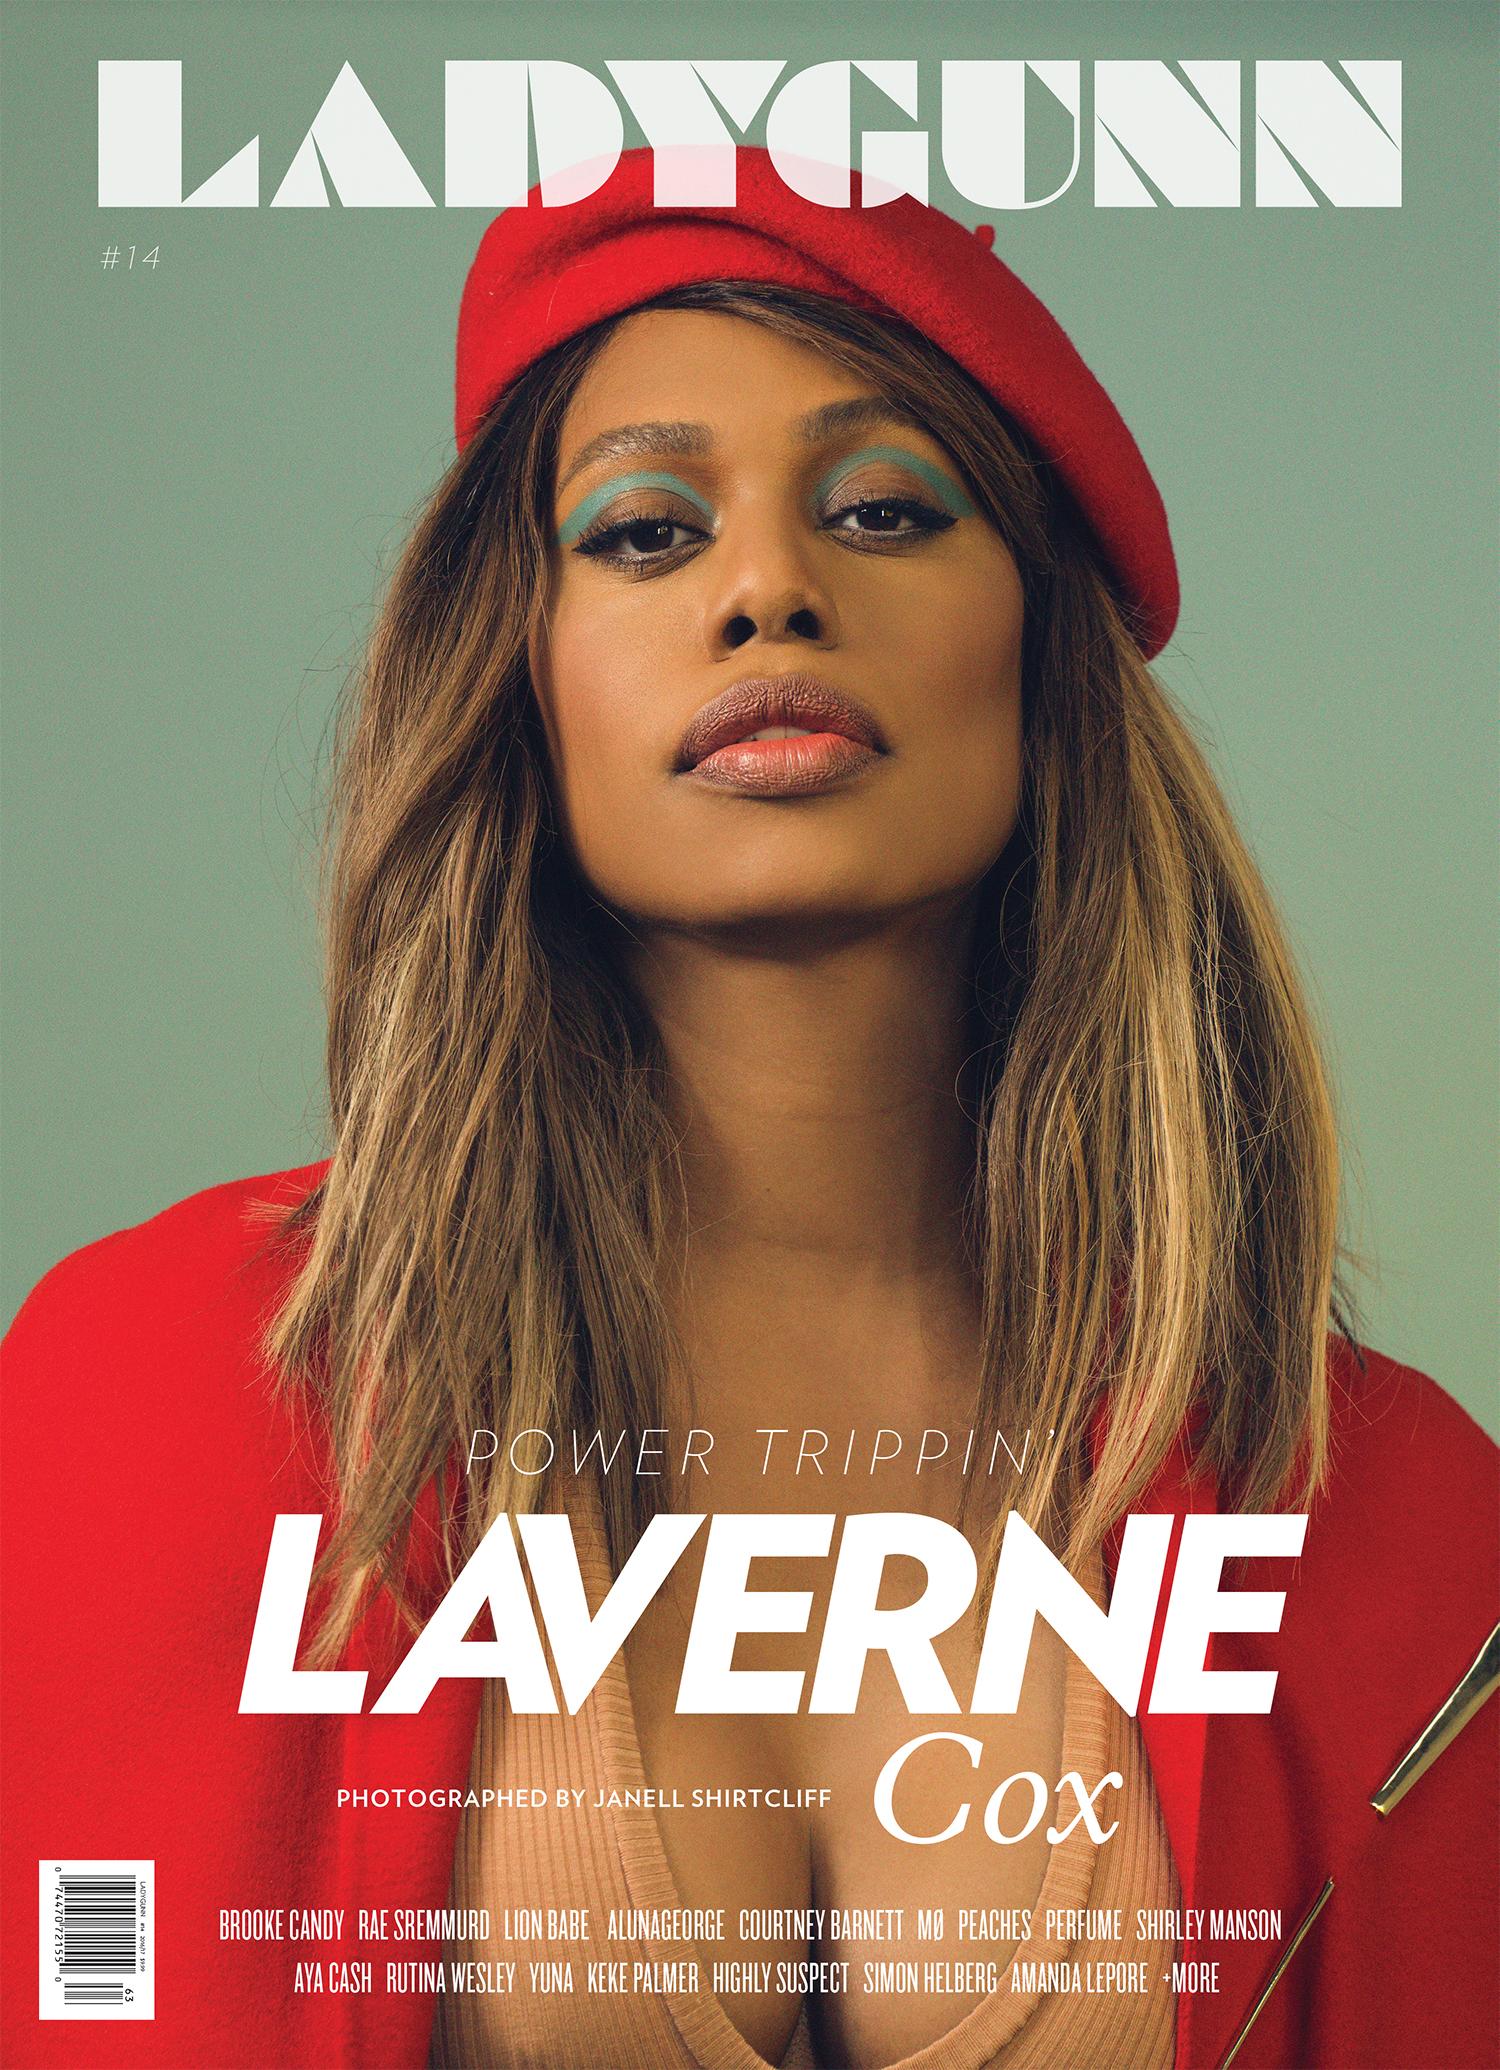 14-ladygunn-laverne-cox-cover-hr